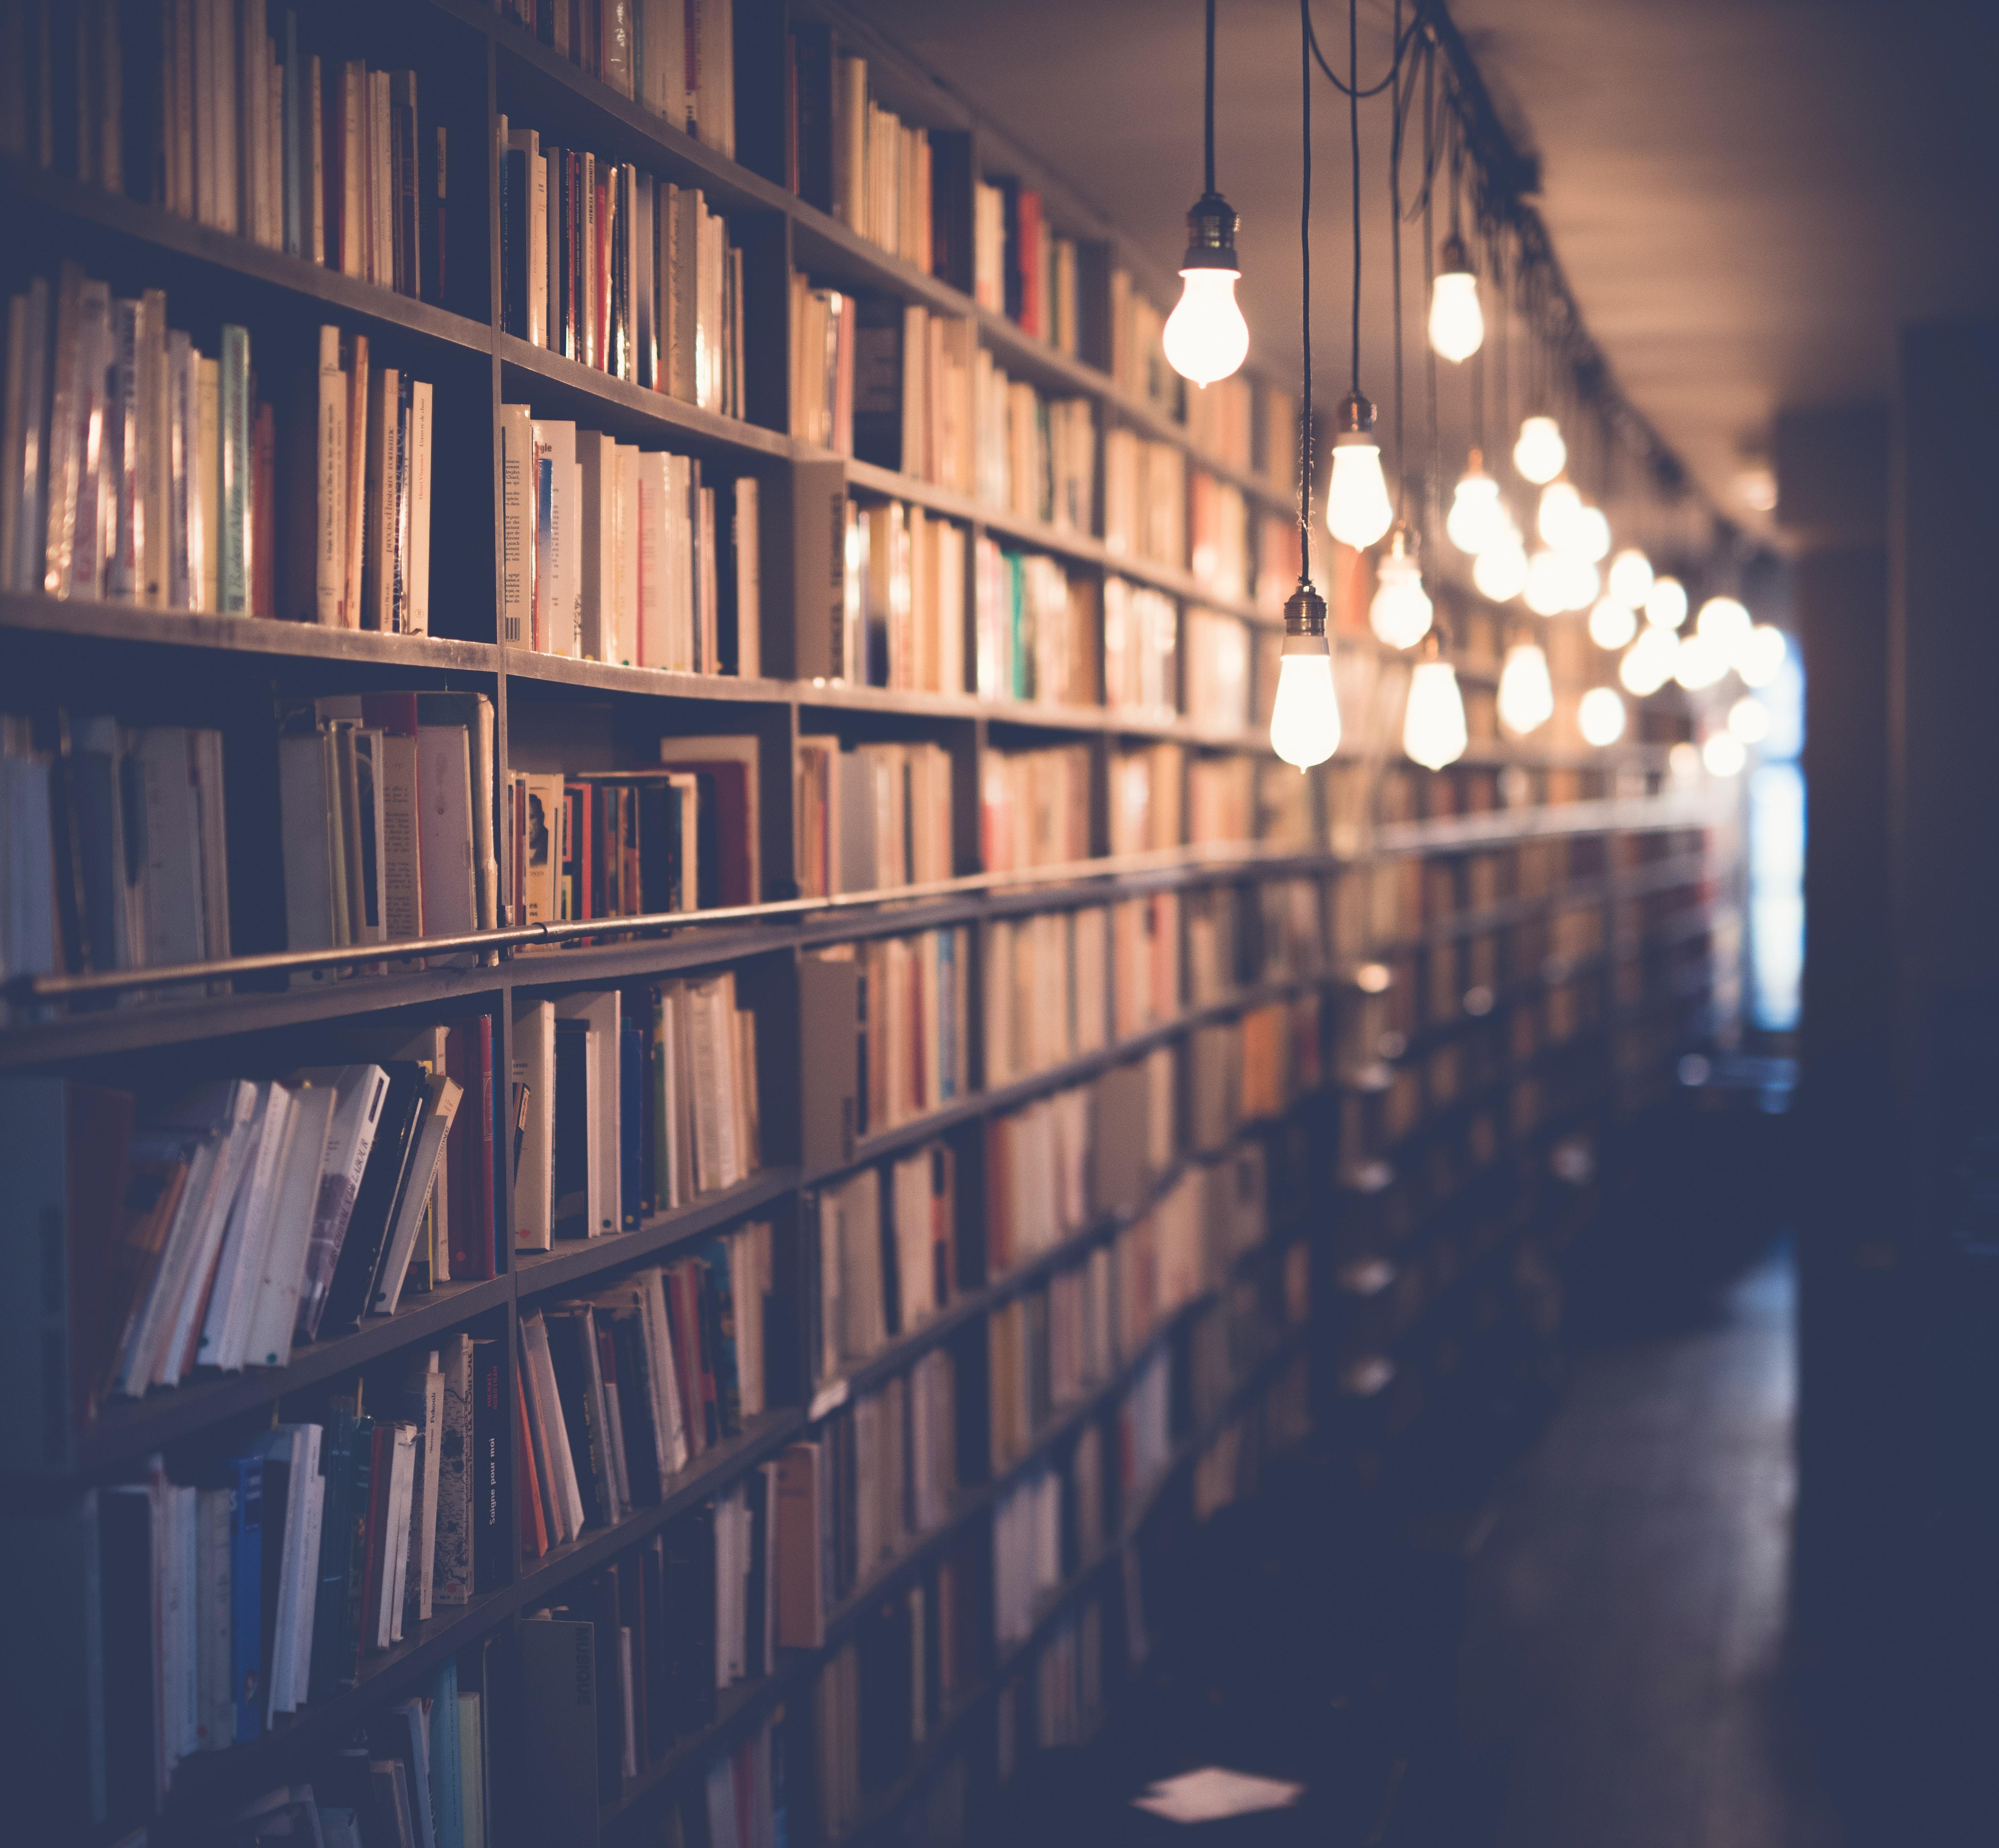 NIV Biblical Theology Study Bible - 101 Books in Biblical Theology